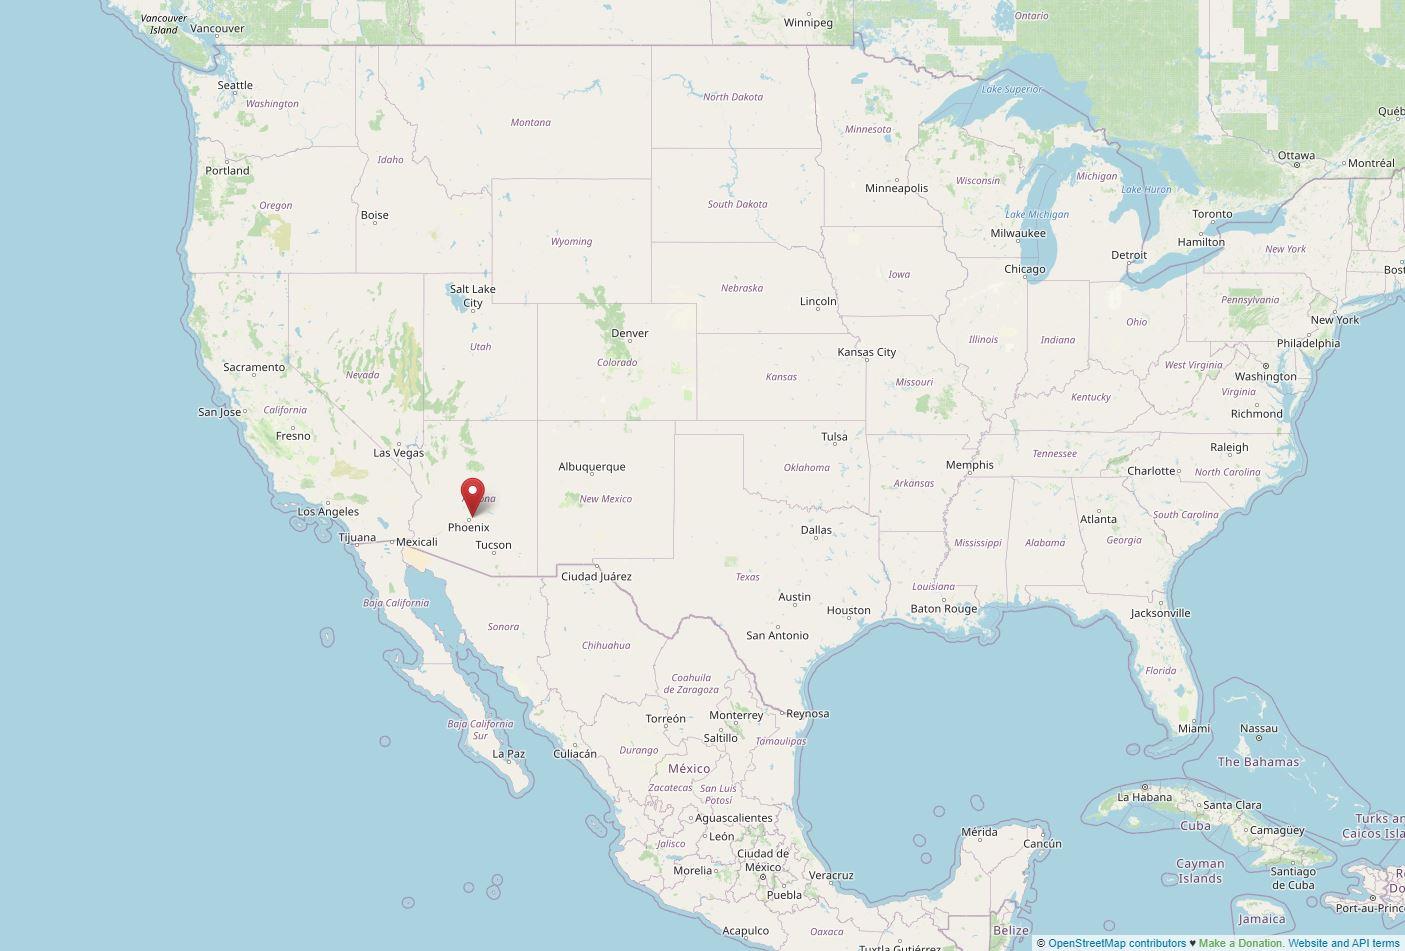 Spend your winter in Scottsdale, Arizona: Is Scottsdale a good snowbird location? 3